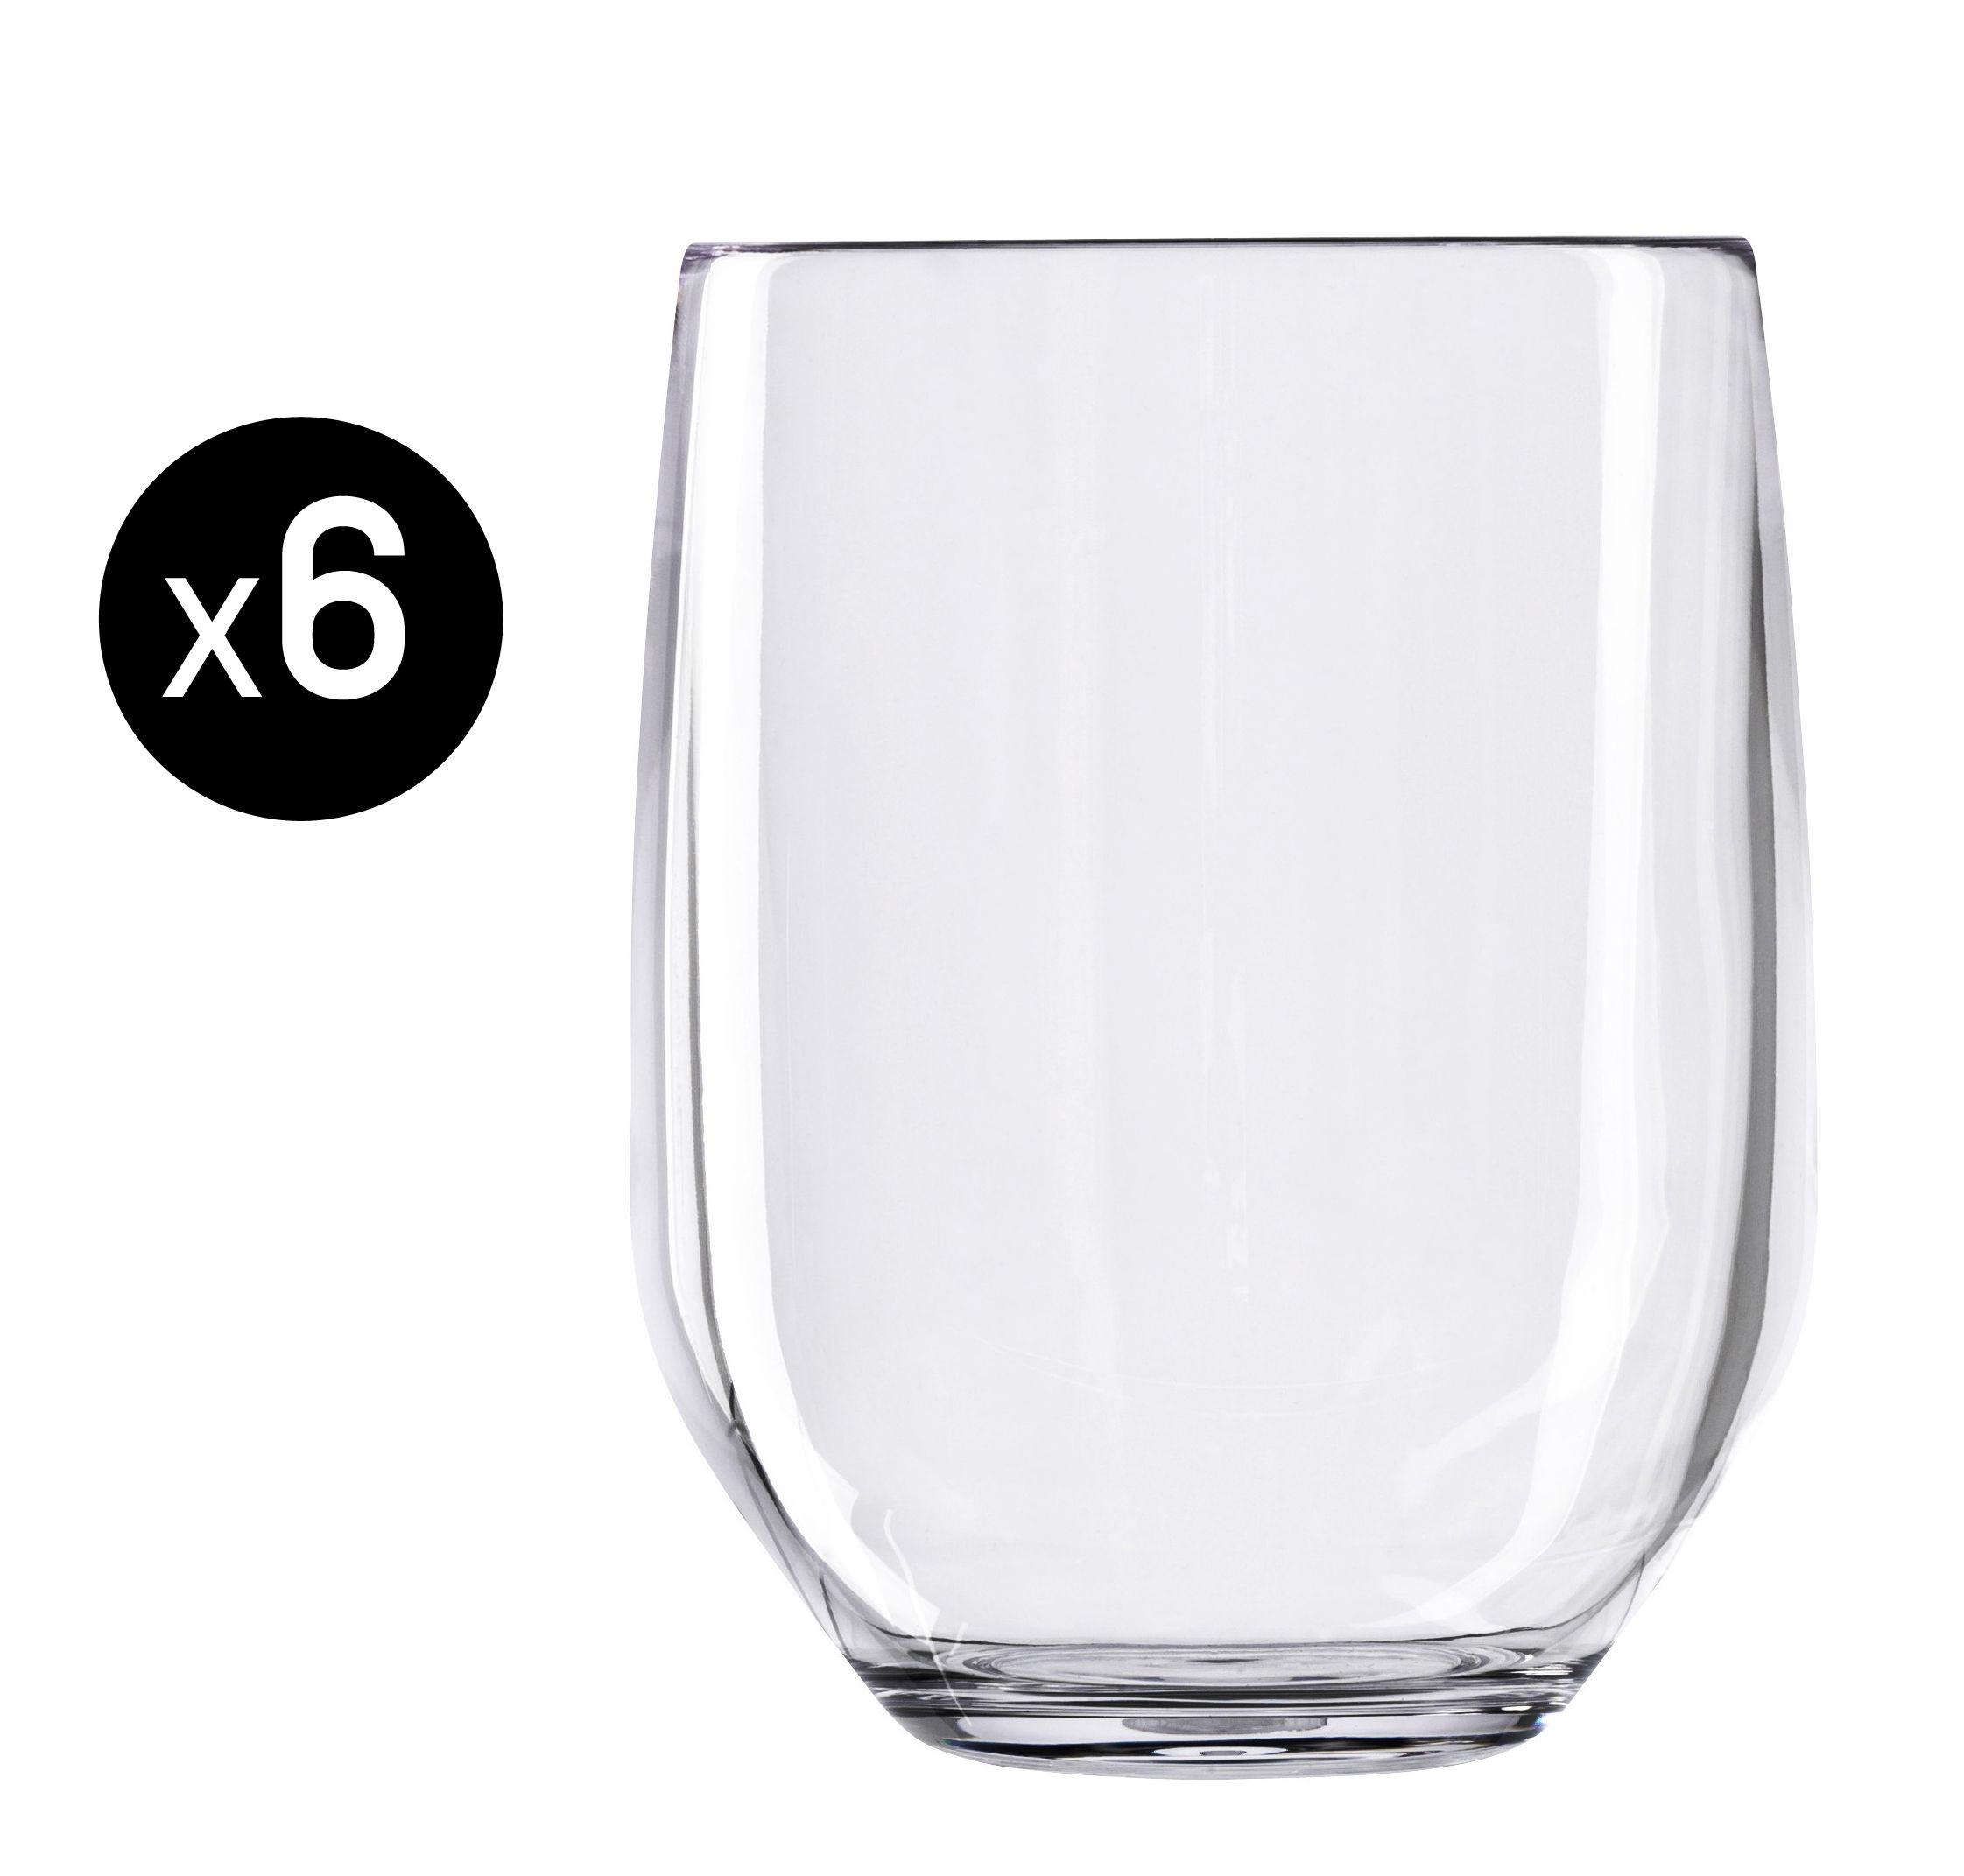 Tavola - Bicchieri  - Bicchiere da whisky Vertical Party Beach - lotto da 2 - 42 cl di Italesse - Trasparente - Policrystal